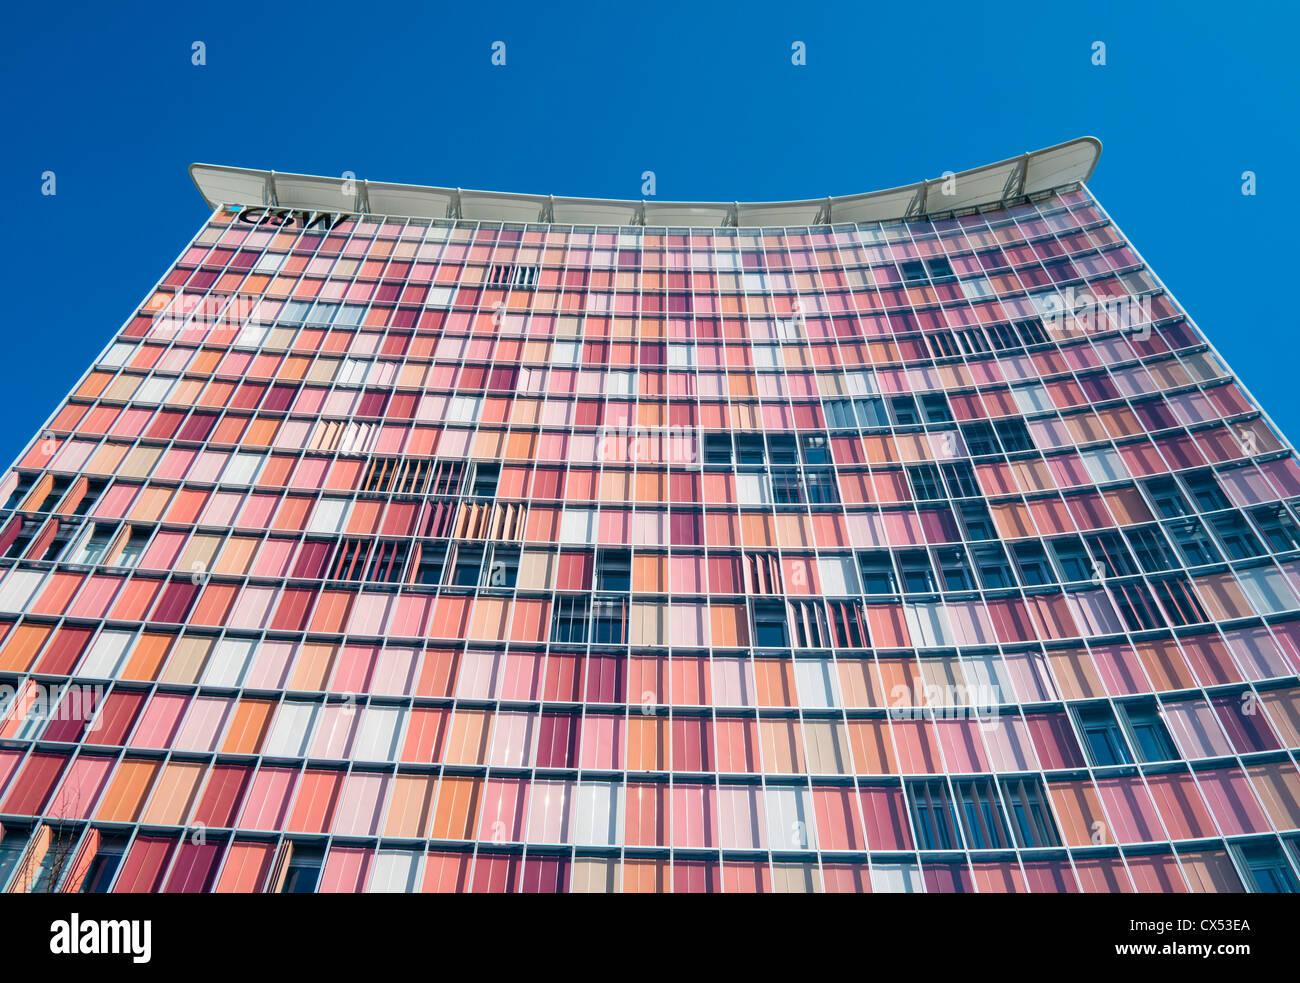 Colorata architettura moderna di GSW torre di uffici a Berlino Germania Immagini Stock